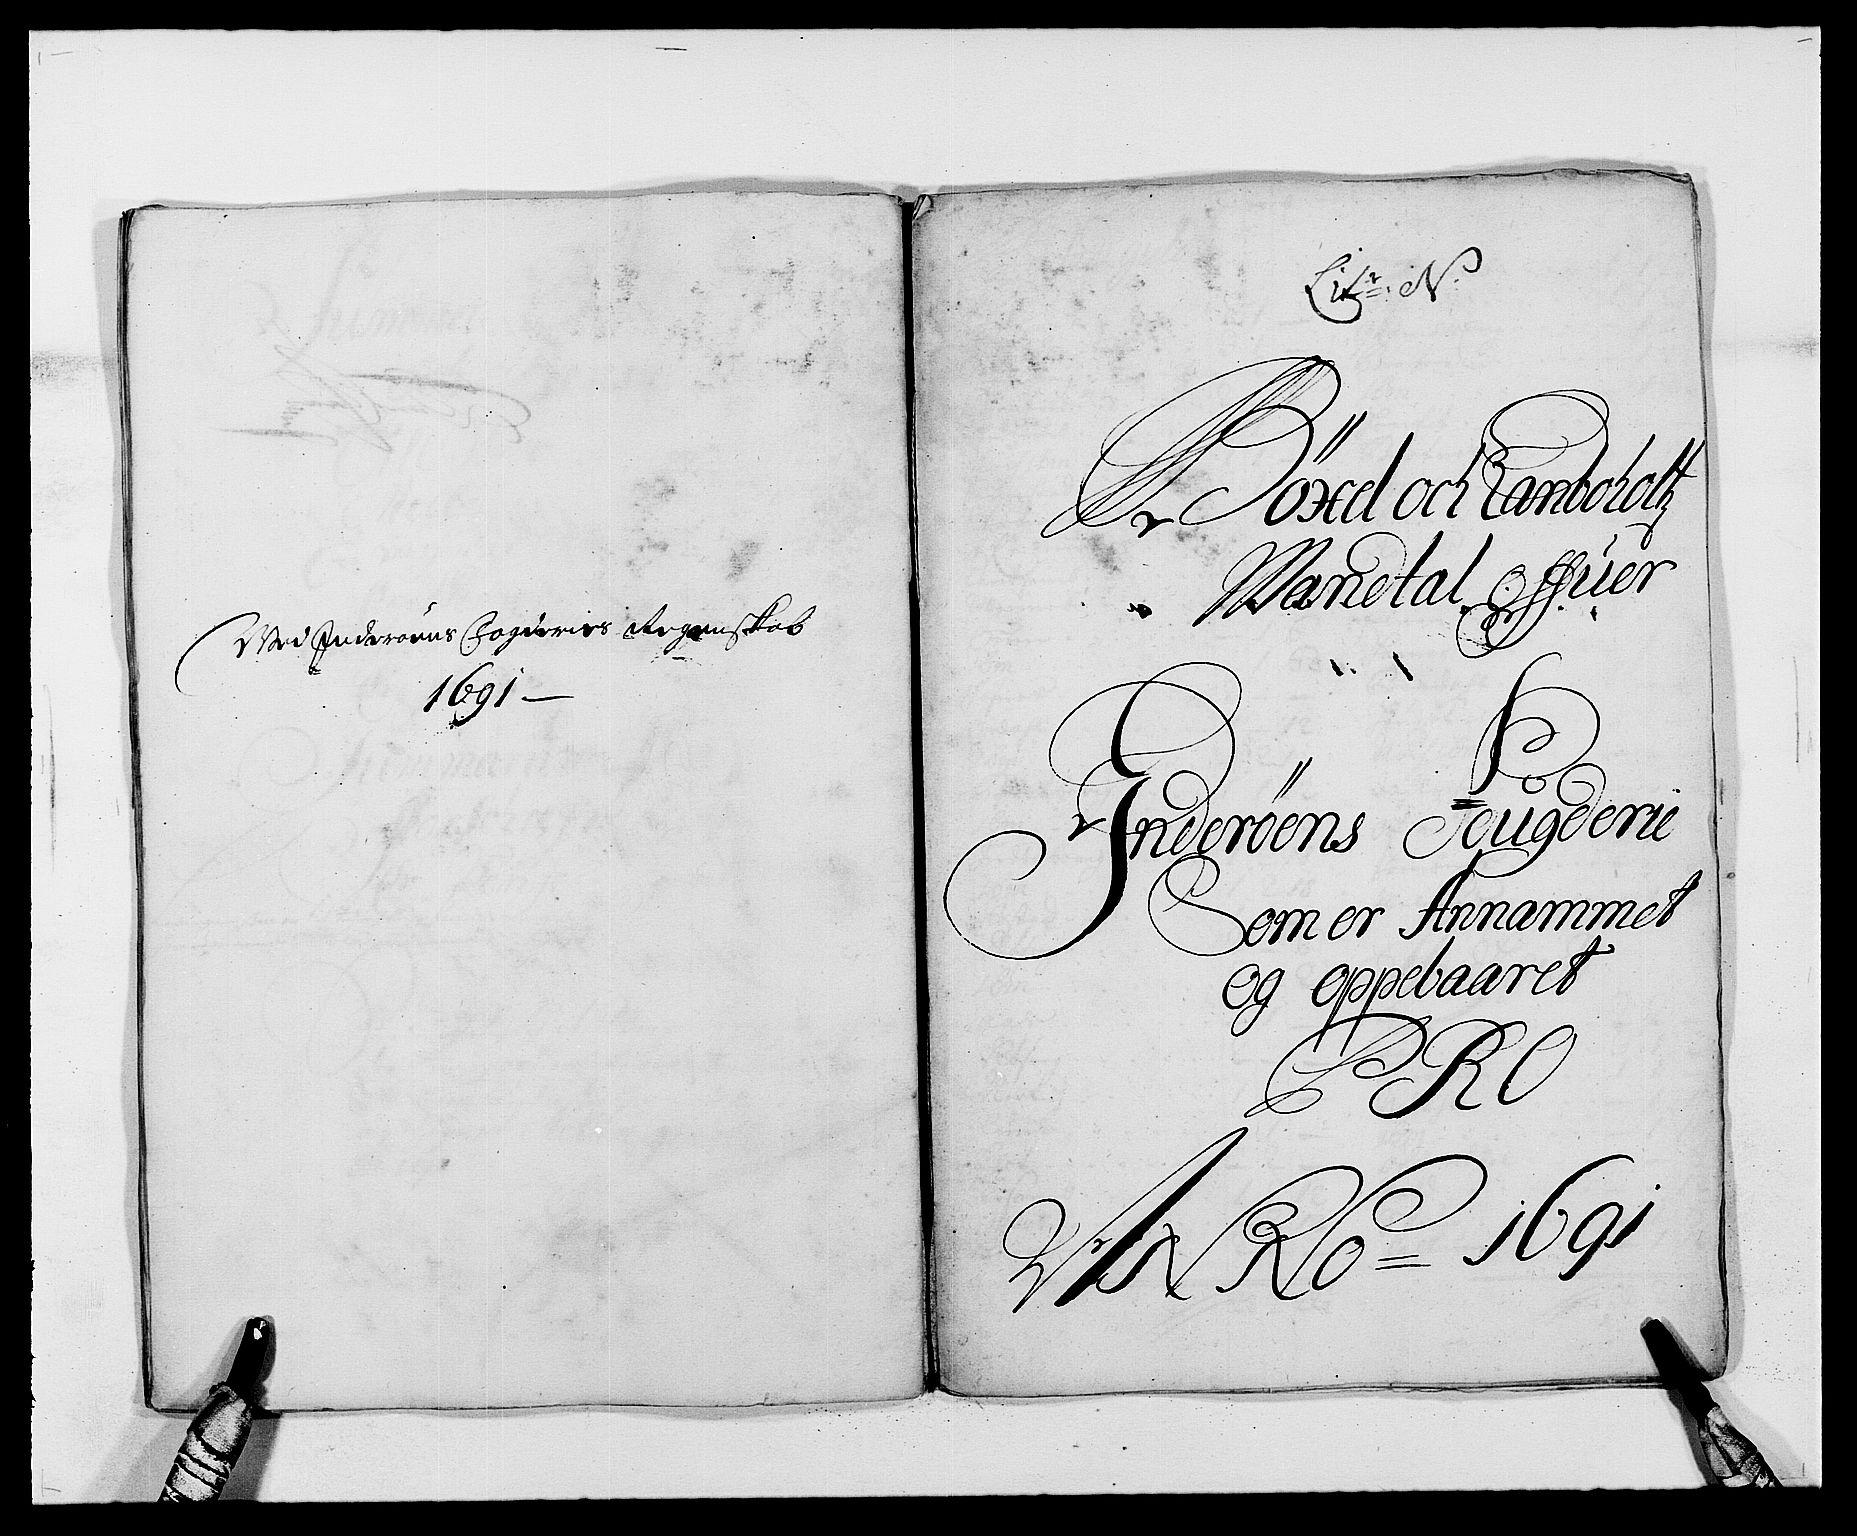 RA, Rentekammeret inntil 1814, Reviderte regnskaper, Fogderegnskap, R63/L4307: Fogderegnskap Inderøy, 1690-1691, s. 398